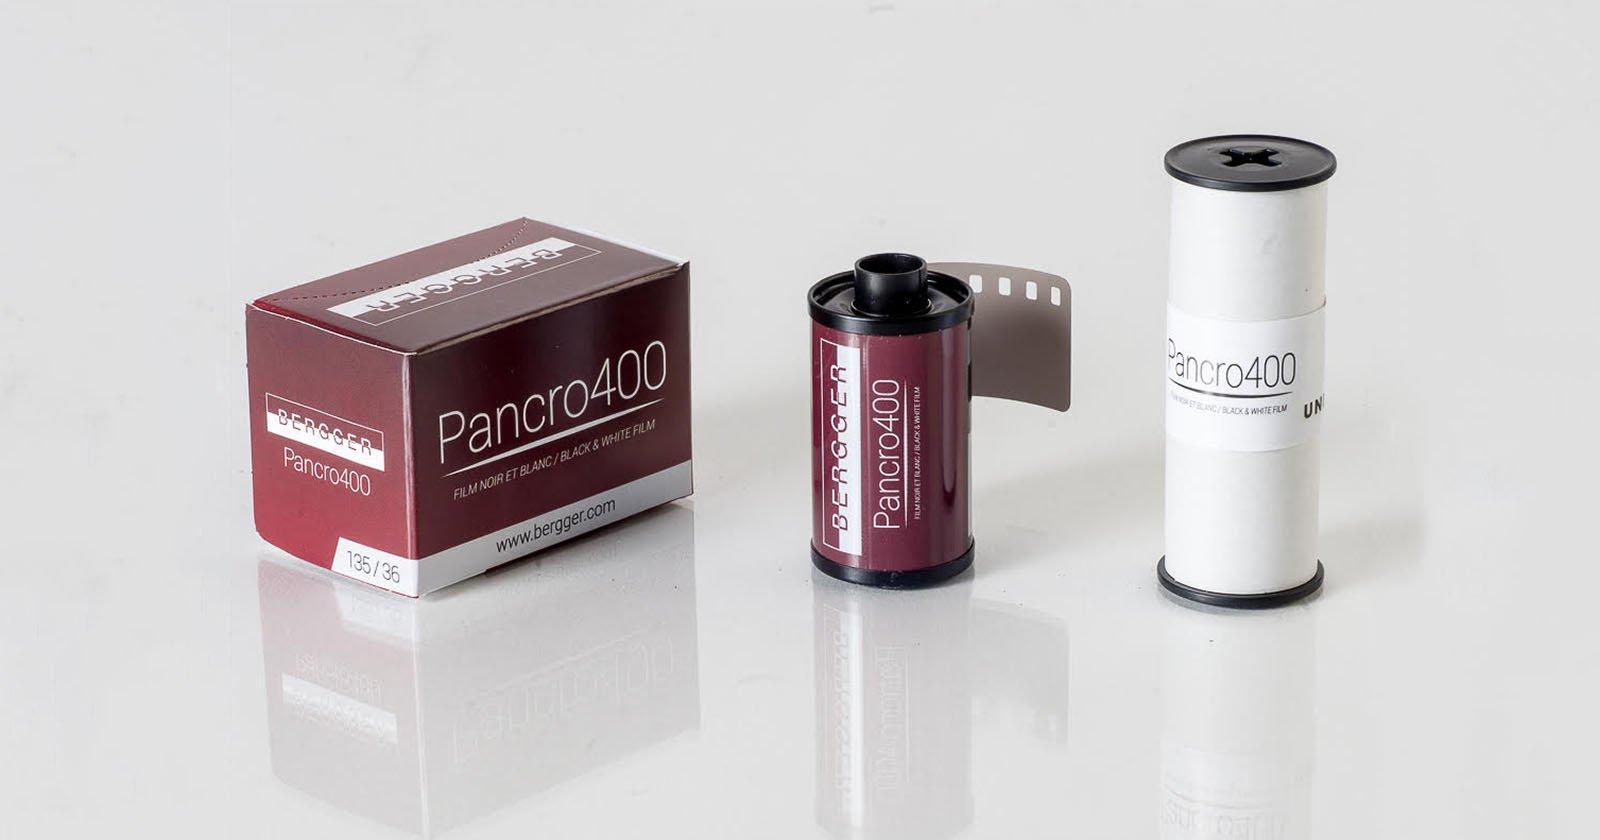 Bergger Pancro400 - Camera.tinhte.vn .jpeg